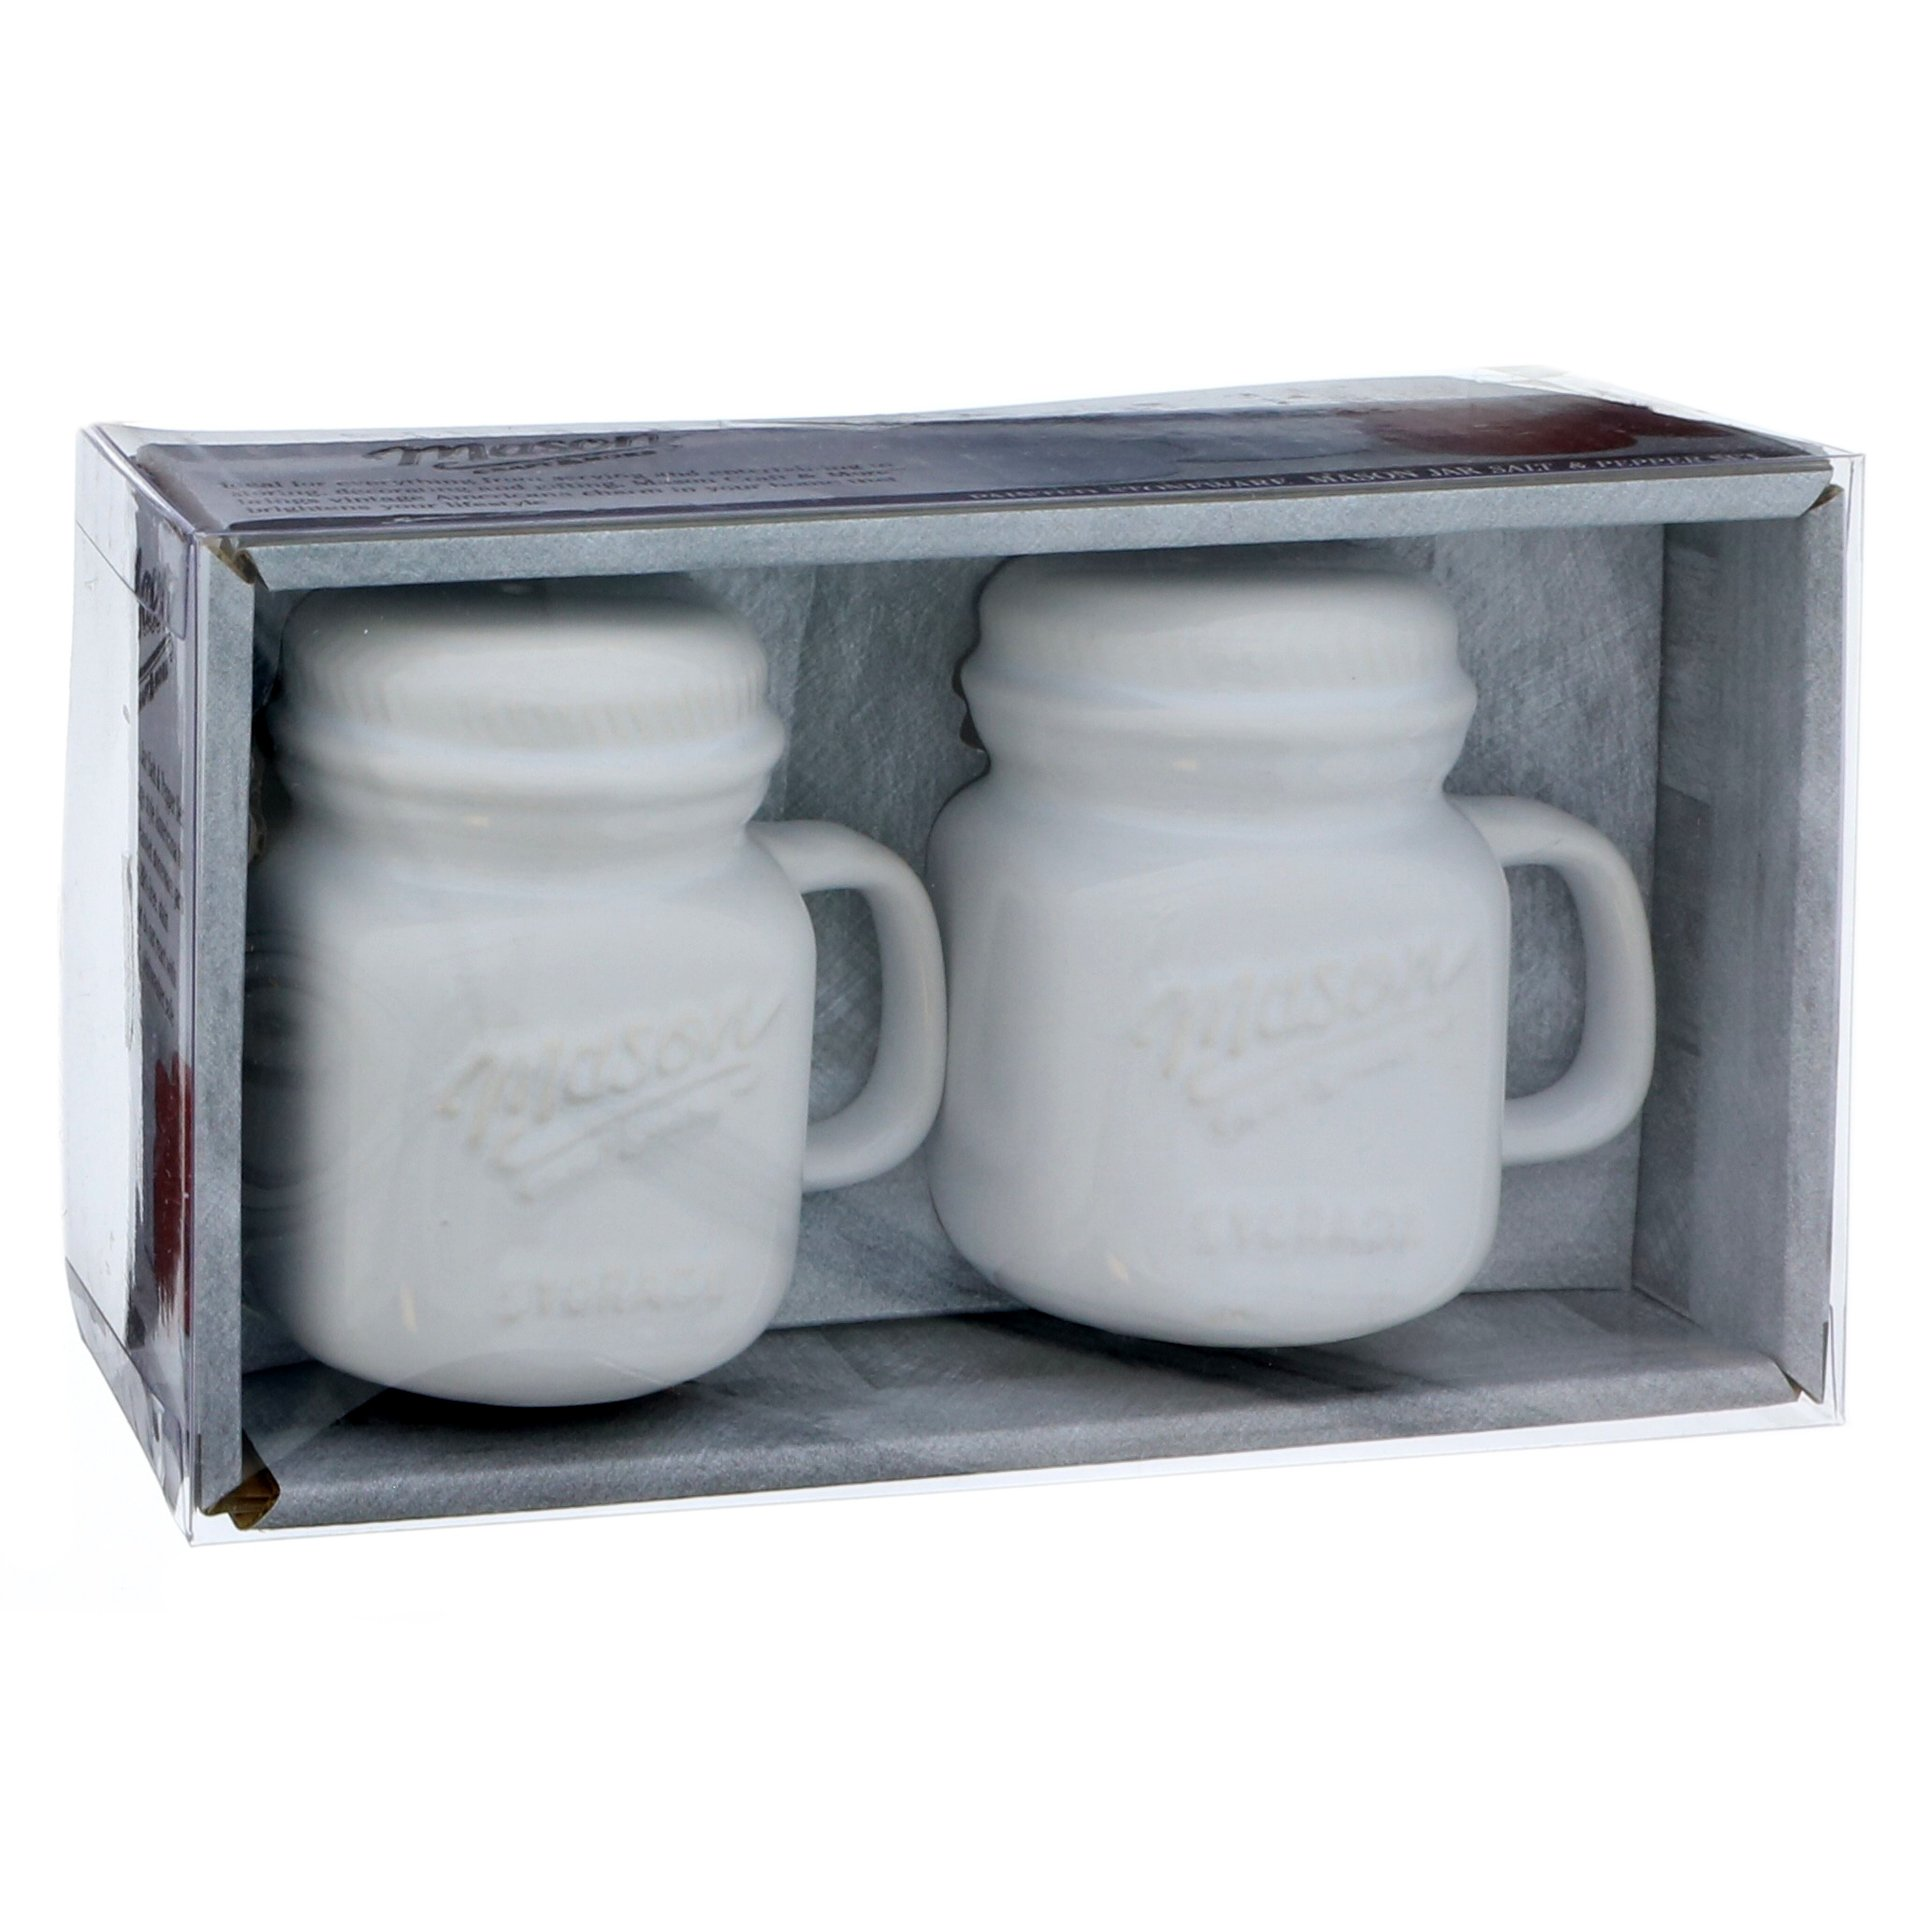 Mason Craft More White Mason Jar Salt Pepper Shaker Set Shop Utensils Gadgets At H E B